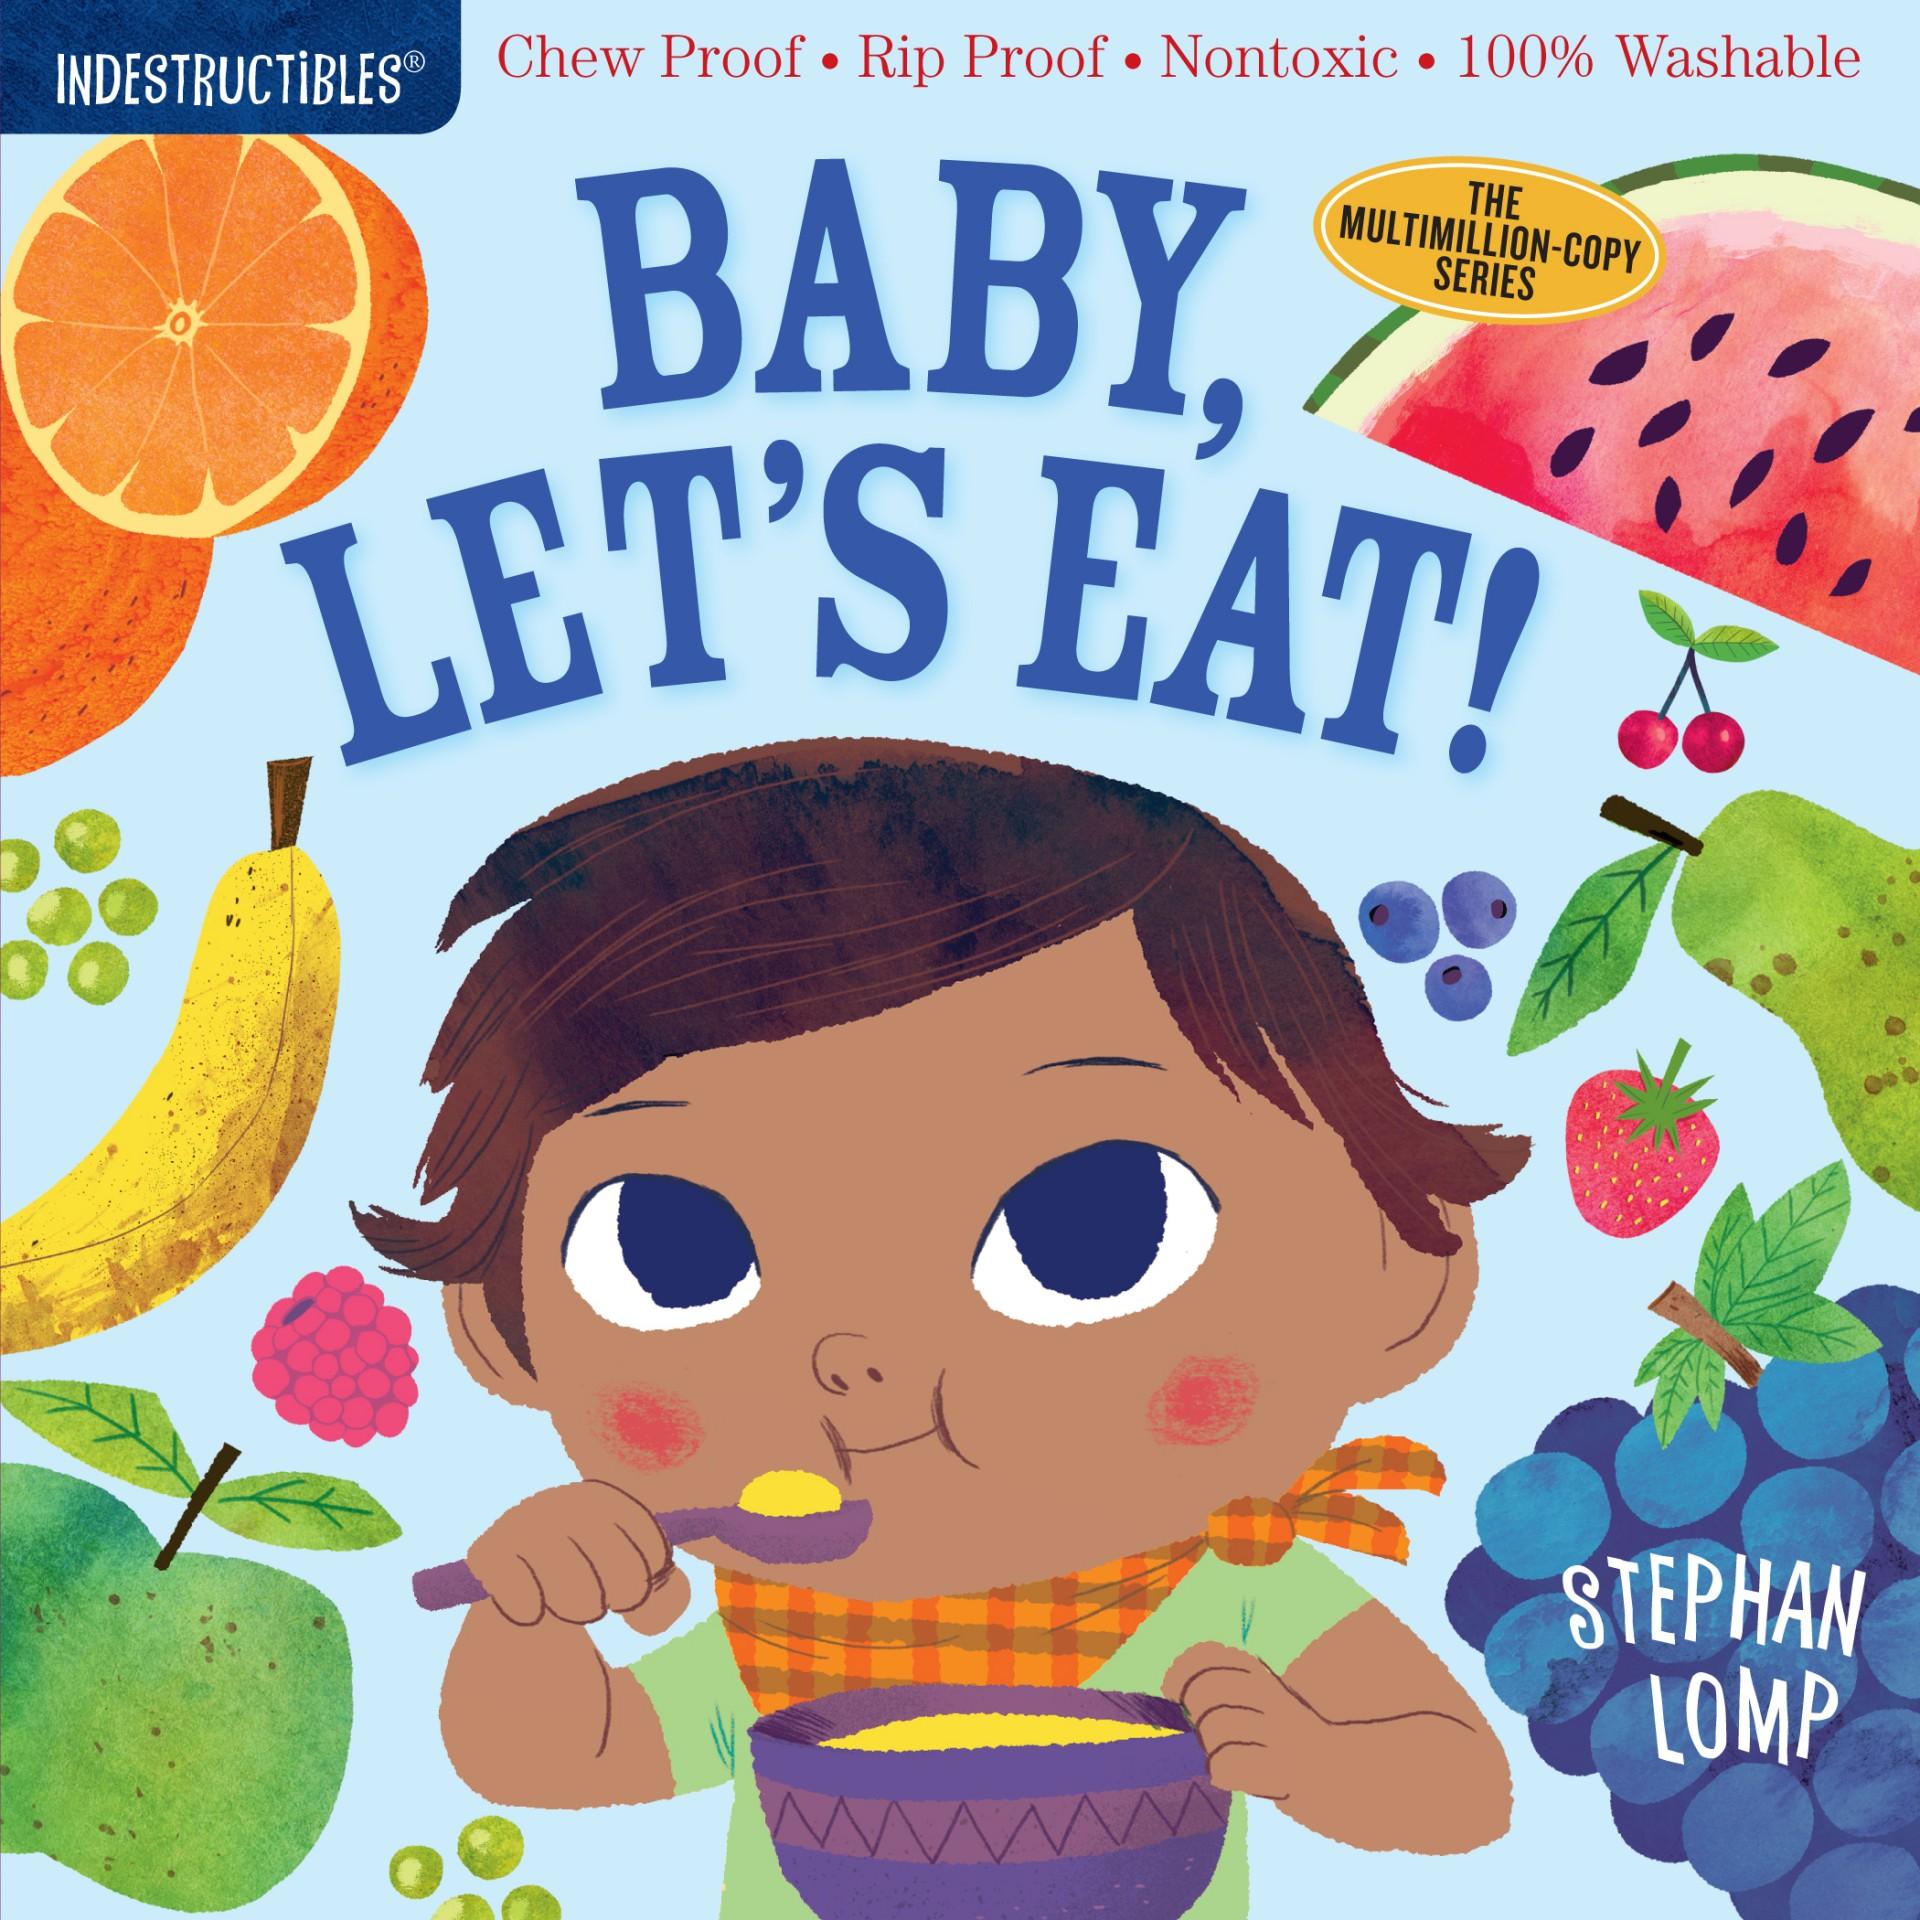 Baby, Let's Eat! | Indestructibles